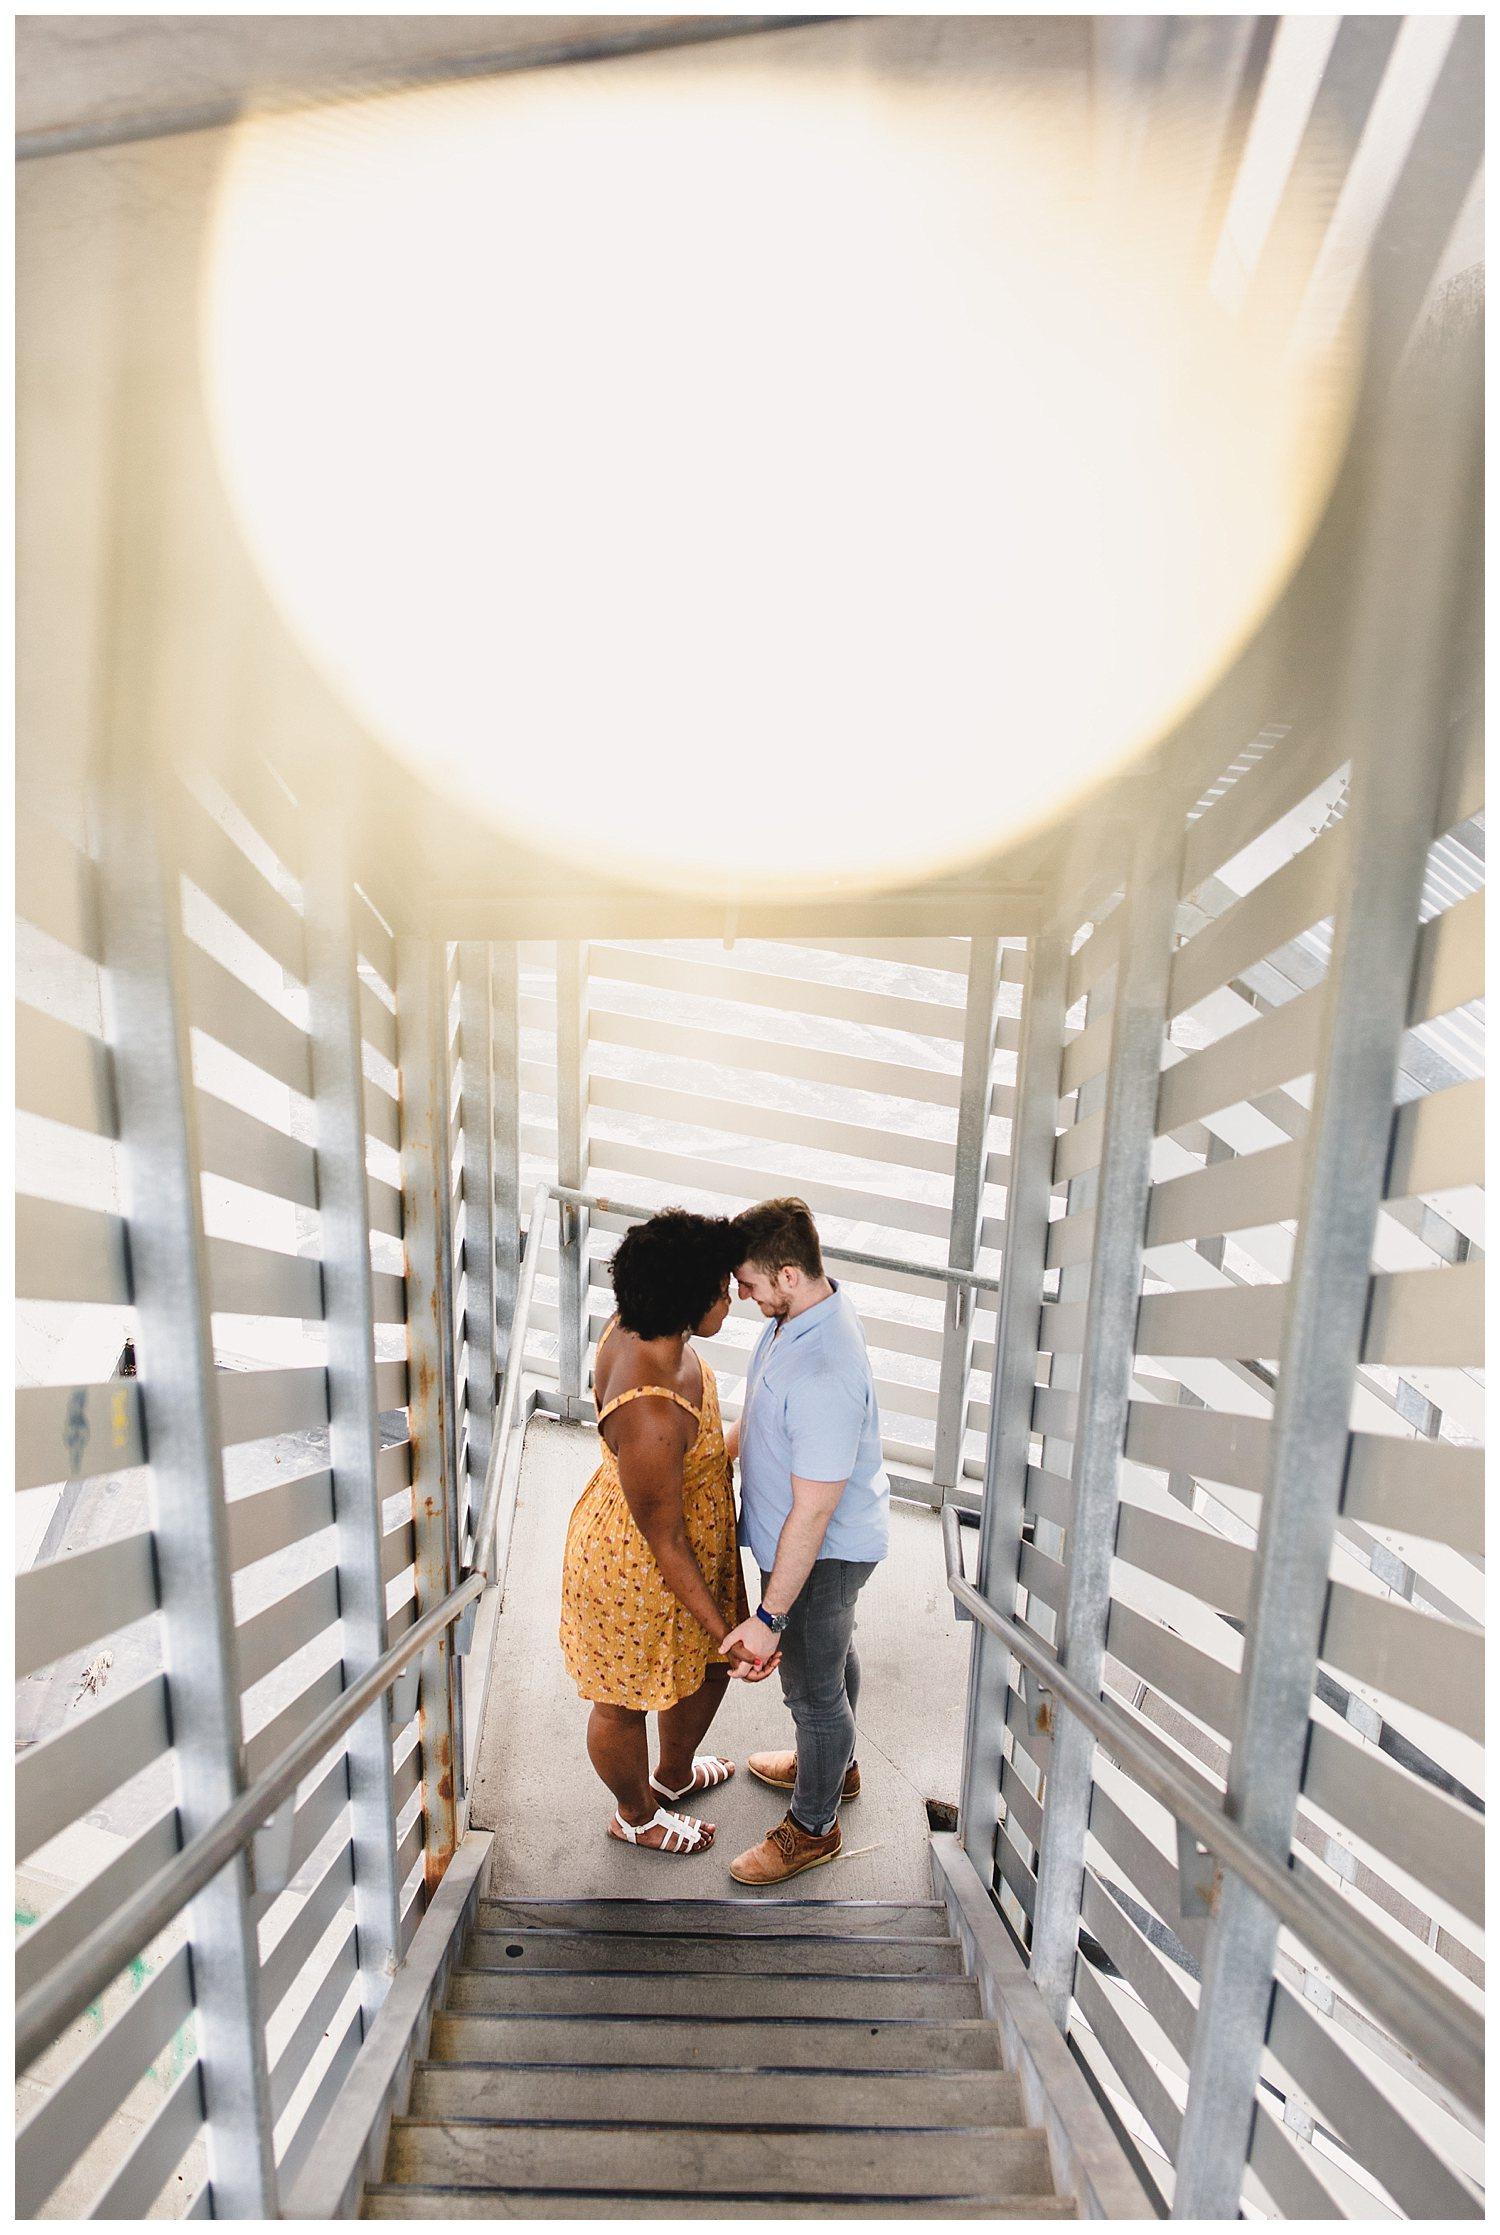 Kelsey_Diane_Photography_Kansas_City_Engagement_Wedding_Photographer_Midwest_Traveling_Missouri_Bri_Tyler_Arcade_Engagement_Up_Down_Kansas_City_Crossroads_District_0791.jpg